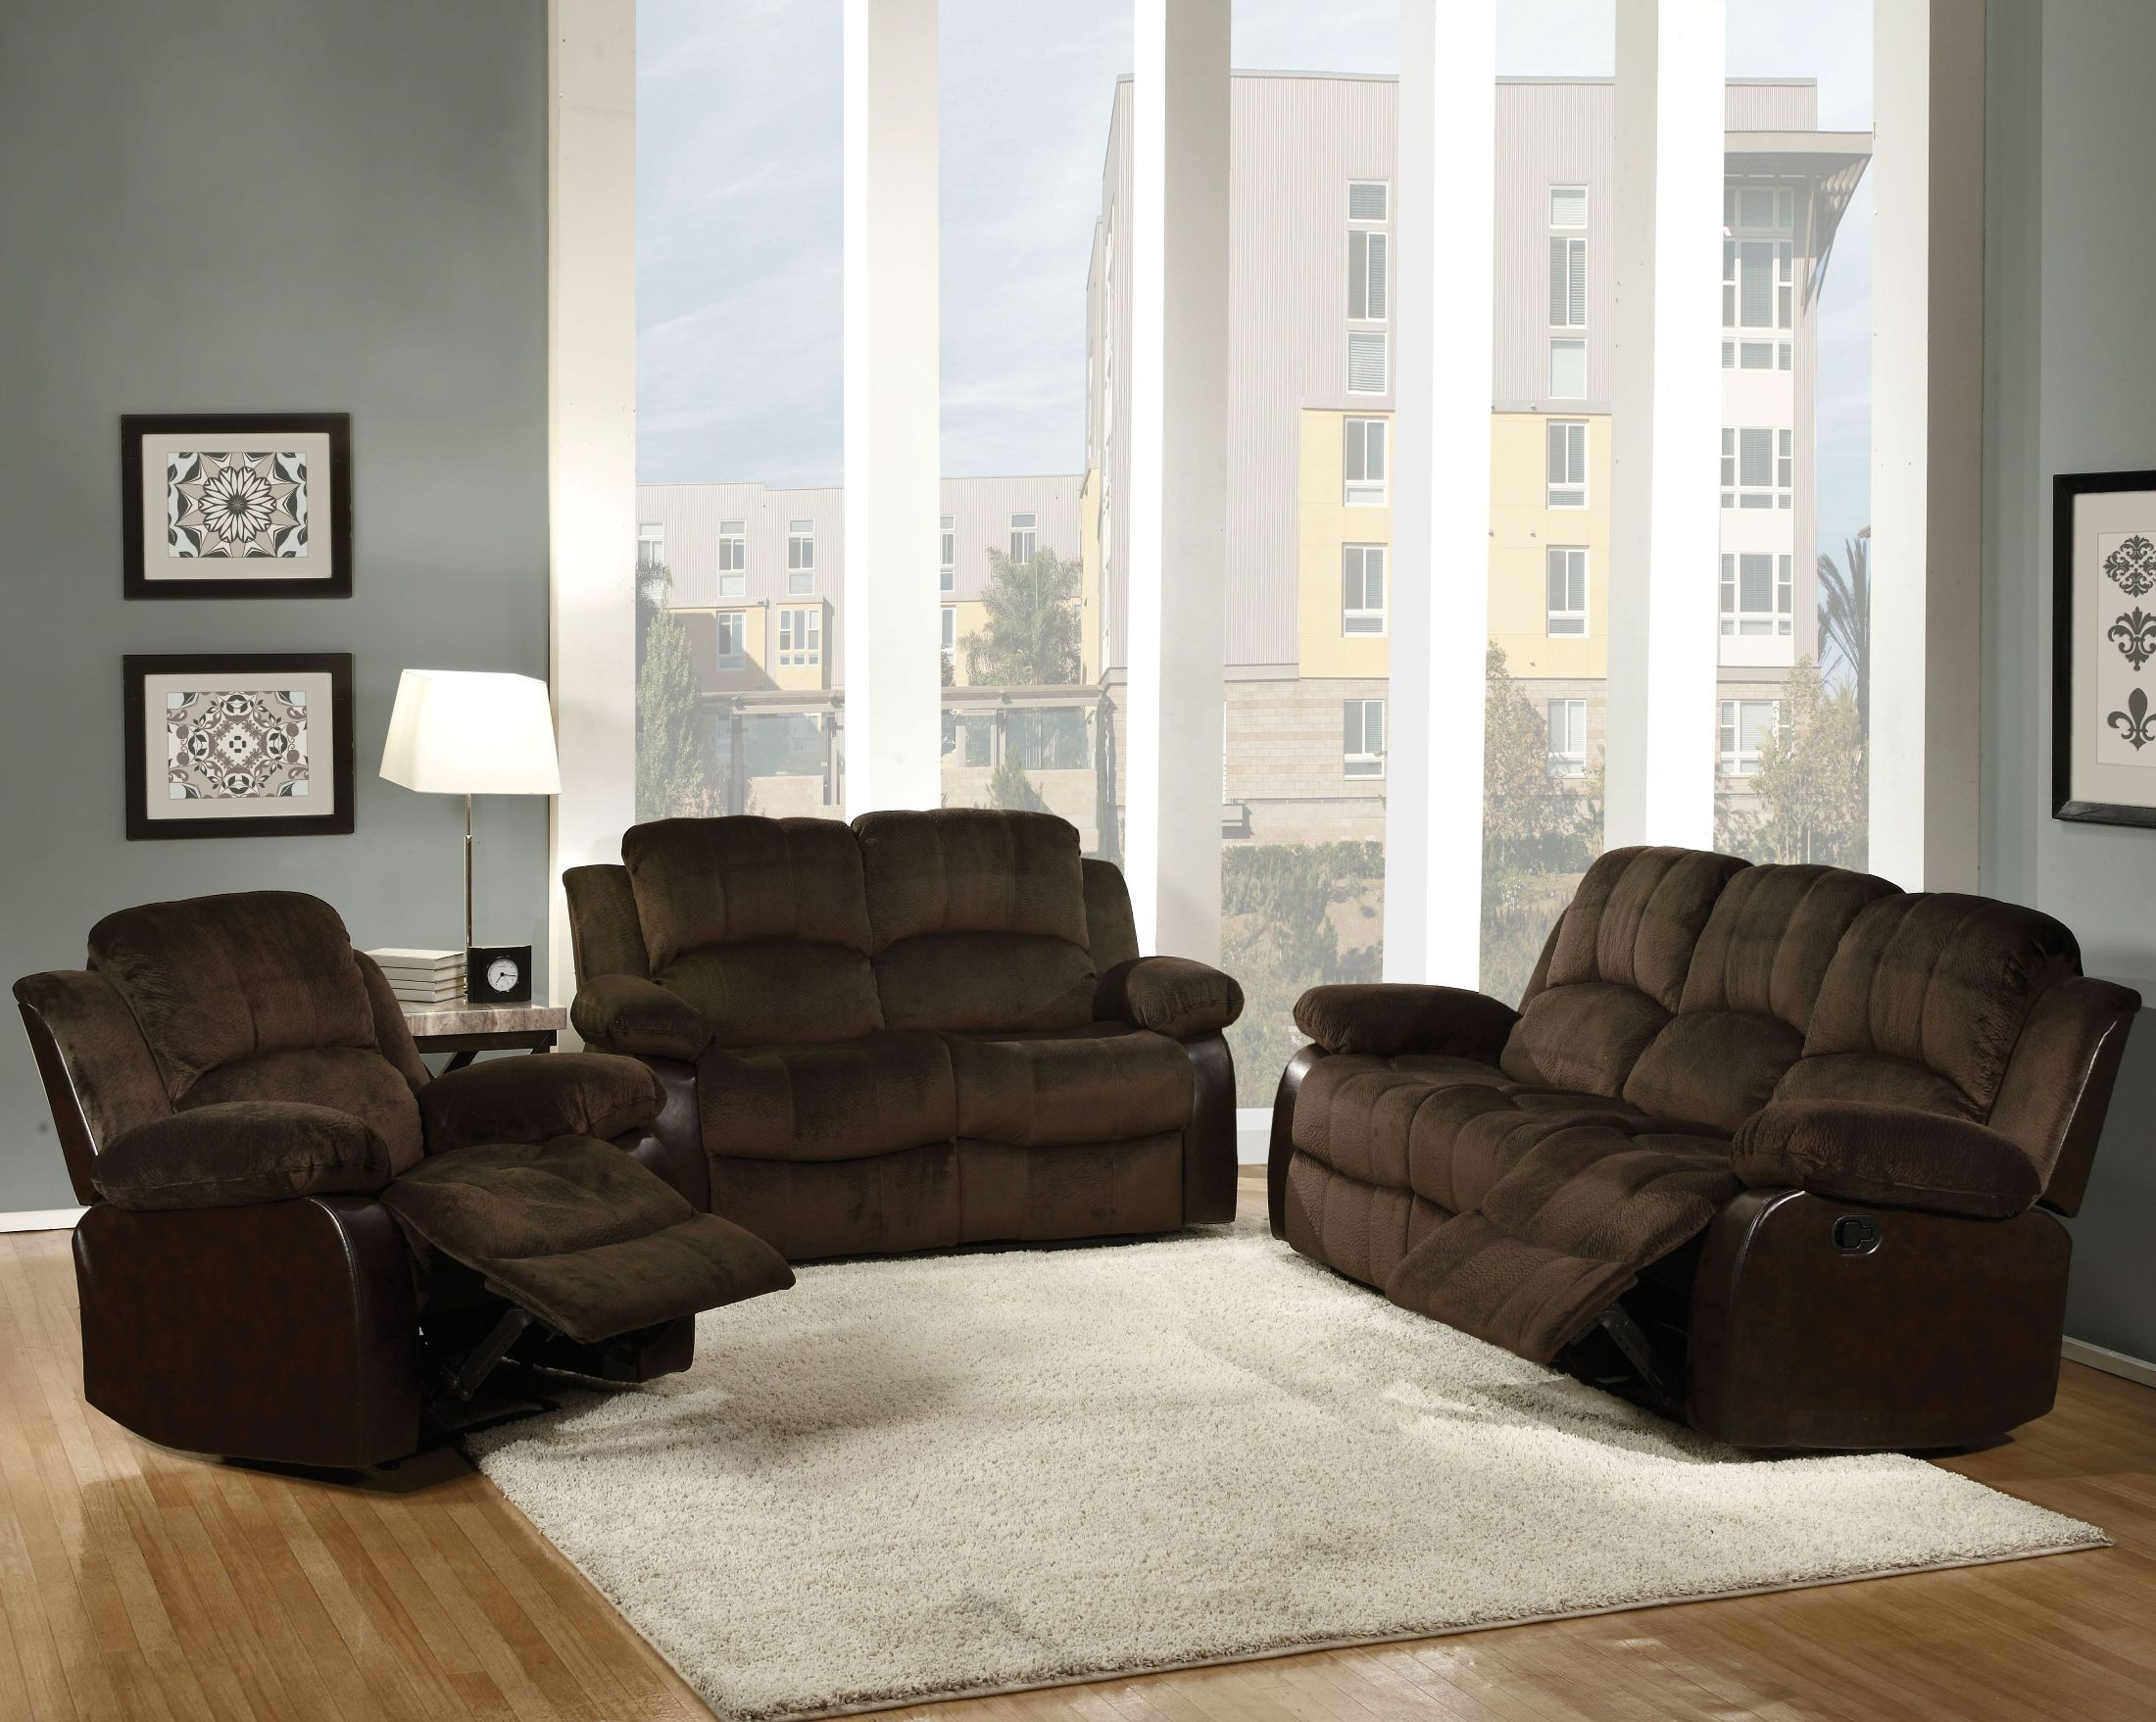 FurnitureETC | Furniture & More Masaccio Brown Champion Reclining ...